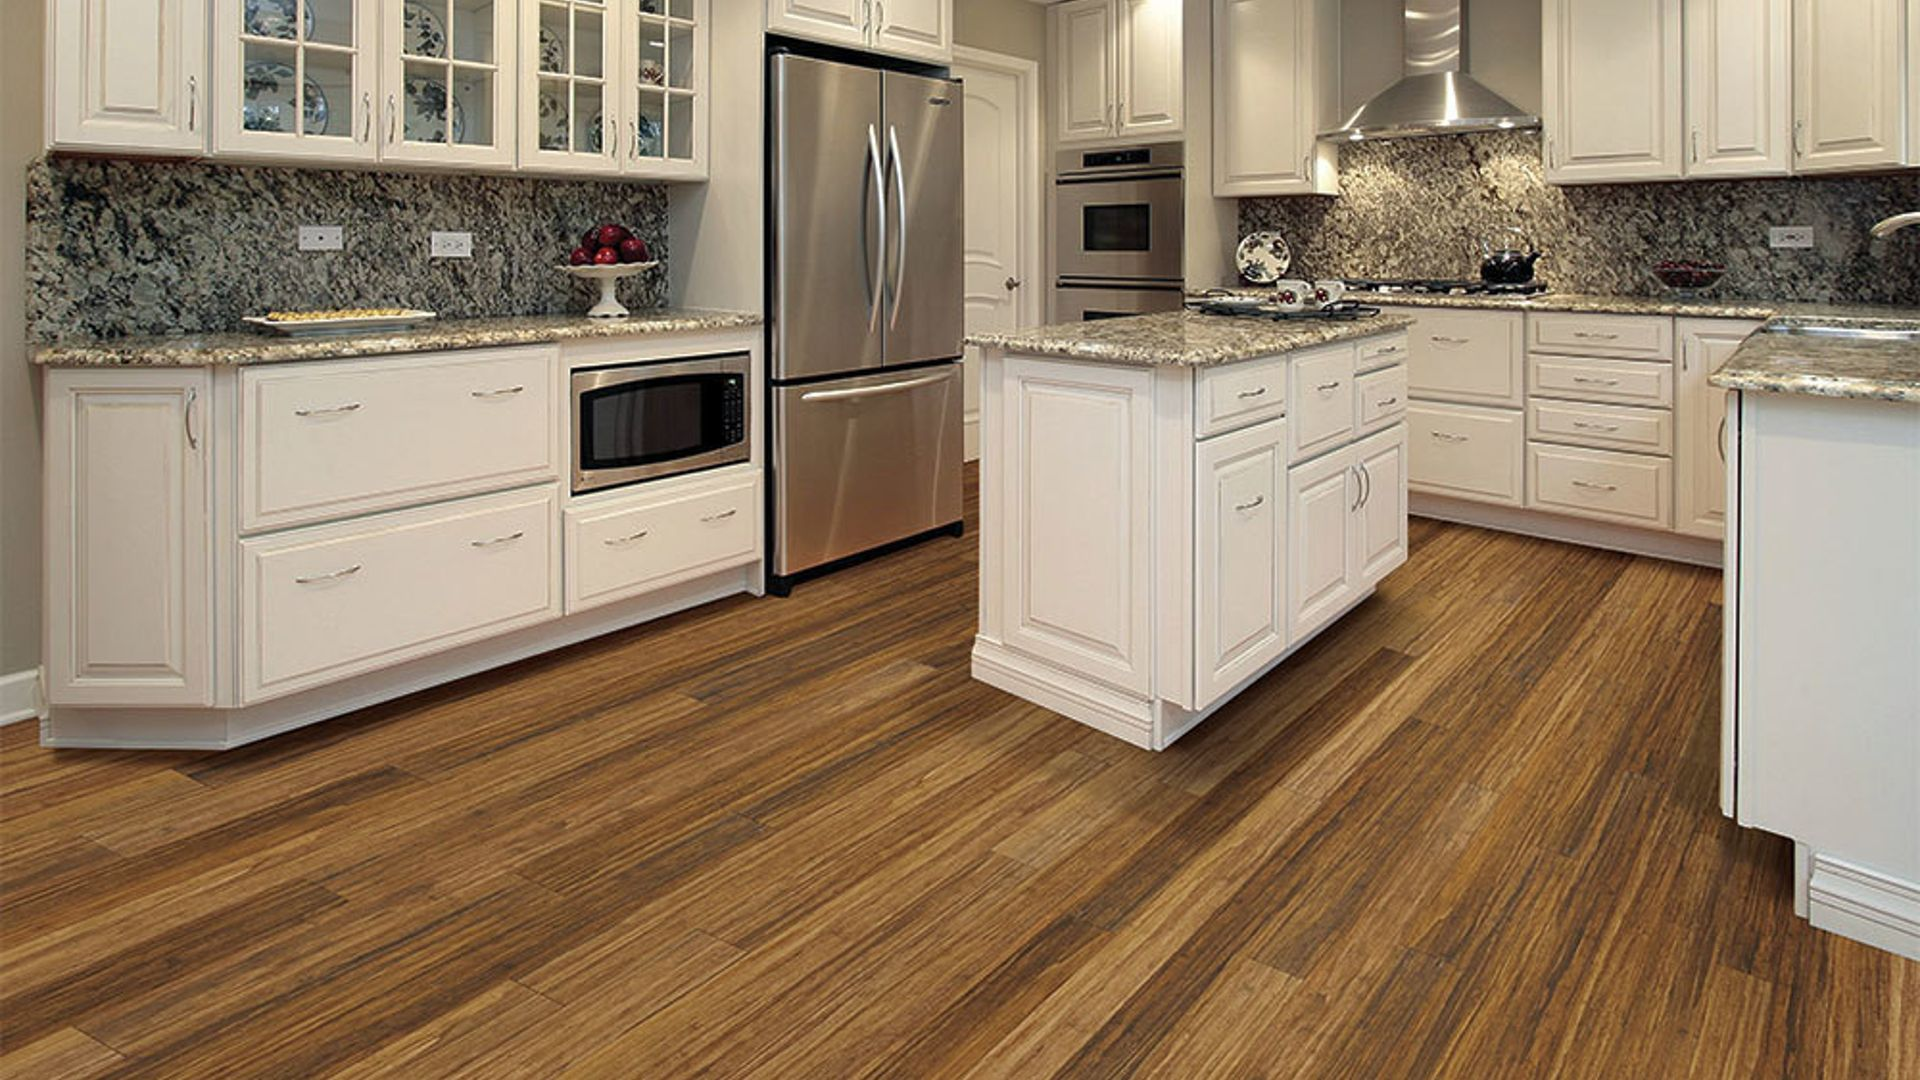 Pinyin Bamboo Vv023 00510 Evp Vinyl Wood Flooring Coretec In 2020 Vinyl Plank Flooring Vinyl Wood Flooring Coretec